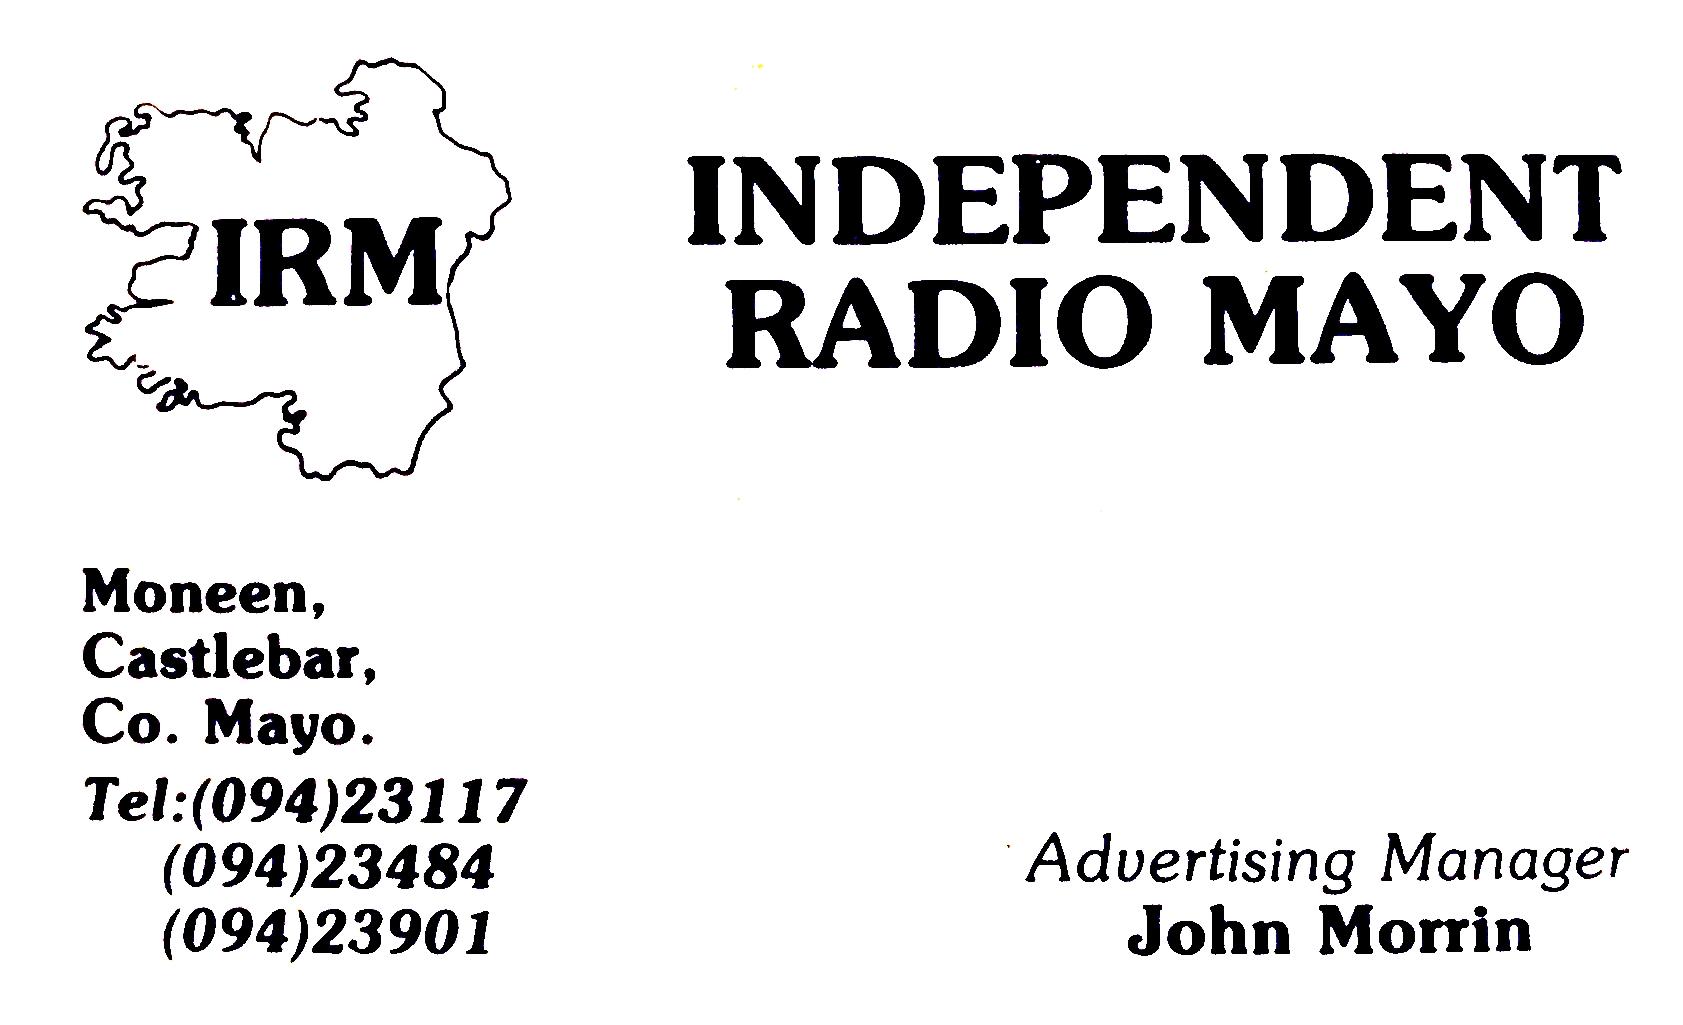 Independent Radio Mayo Radiowaves